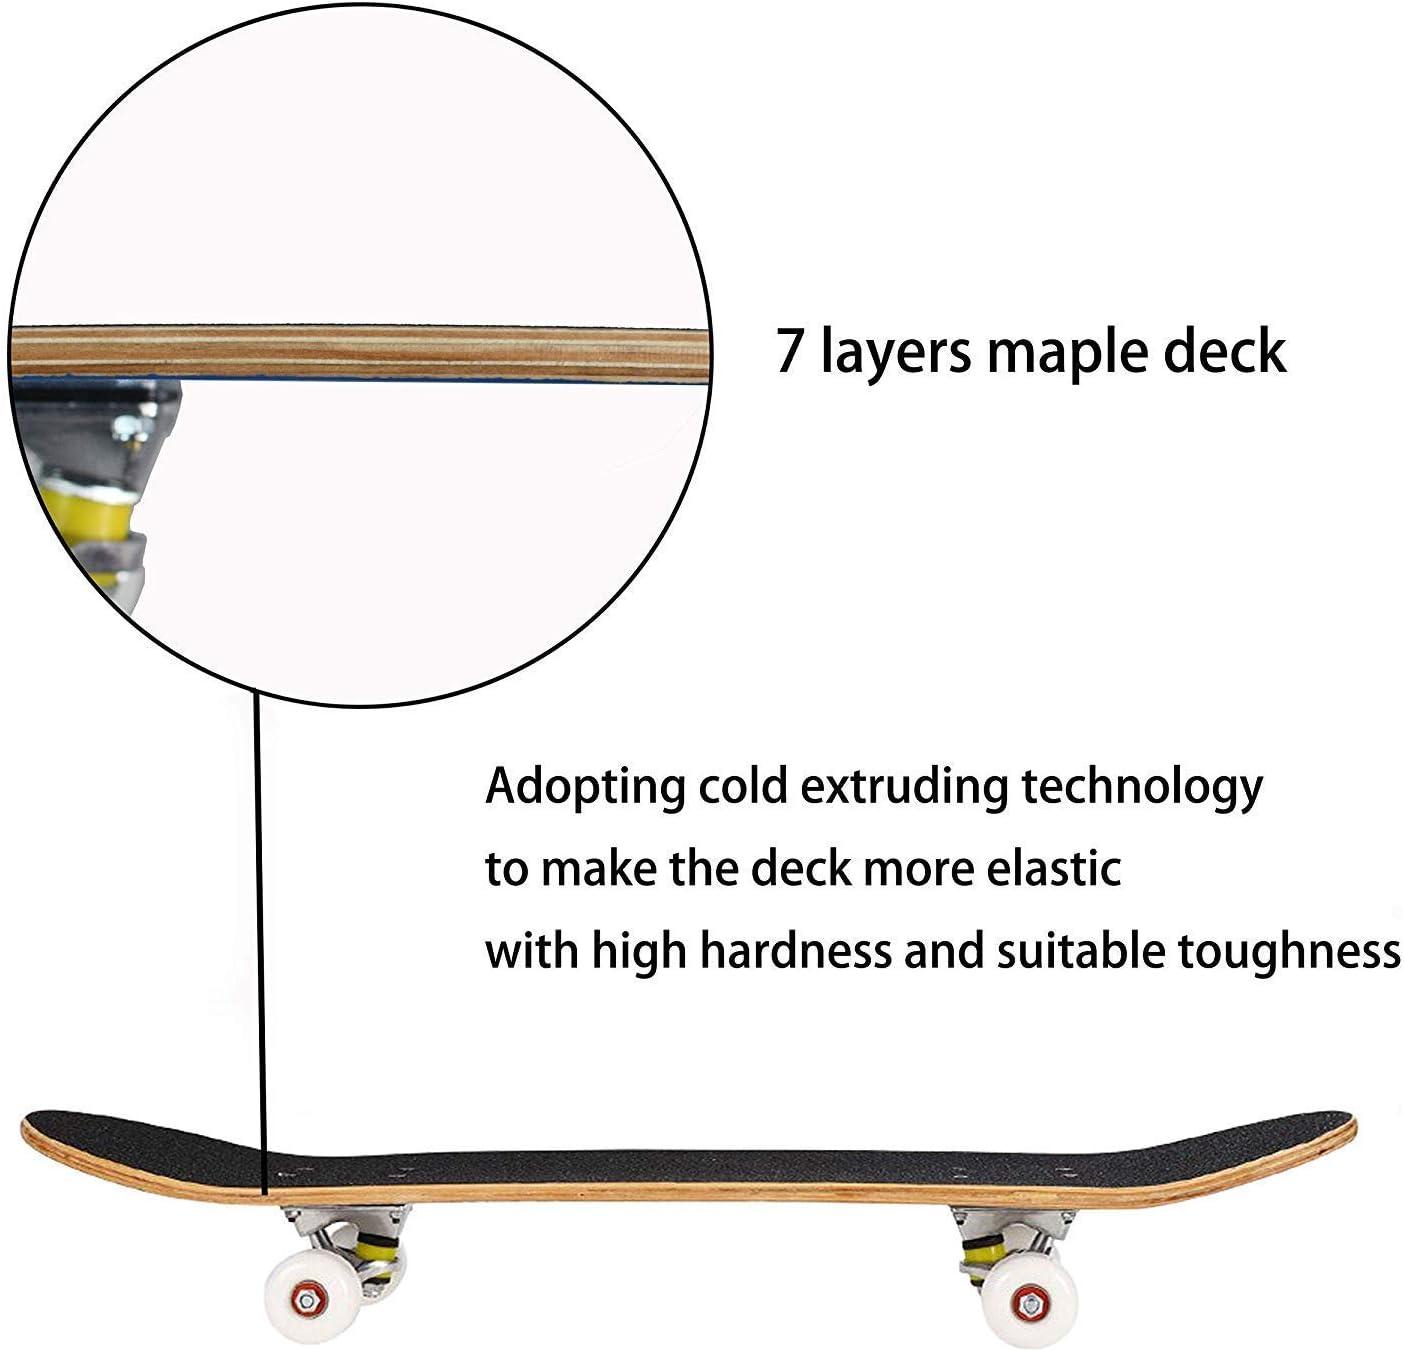 Funtress Skateboard 7 Layers Decks 31x8 Pro Complete Skate Board Maple Wood Outdoor Longboards for Teens Adults Beginners Girls Boys Kids